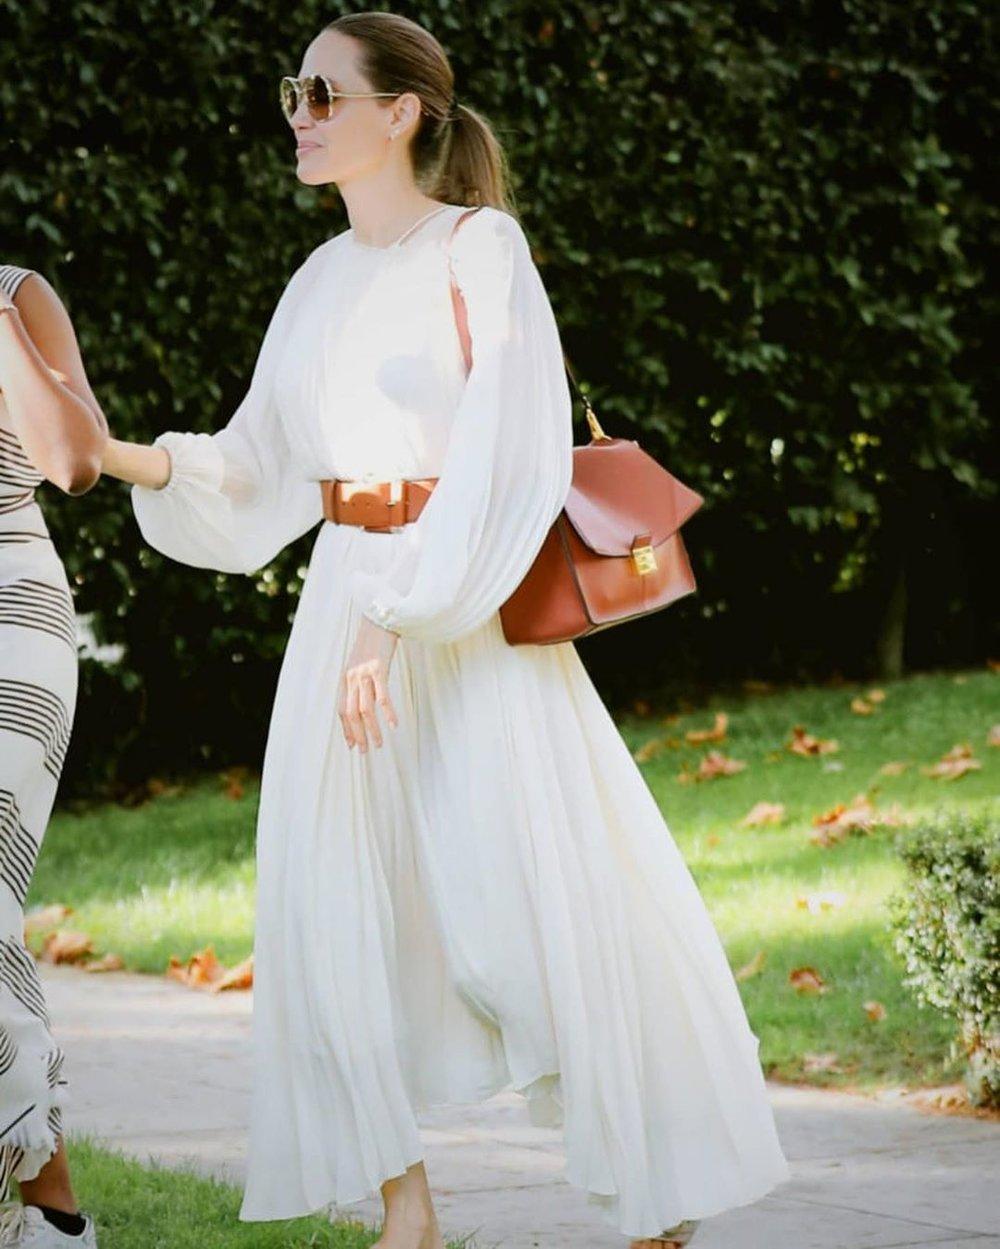 angelina-jolie-the-row-white-dress.jpg